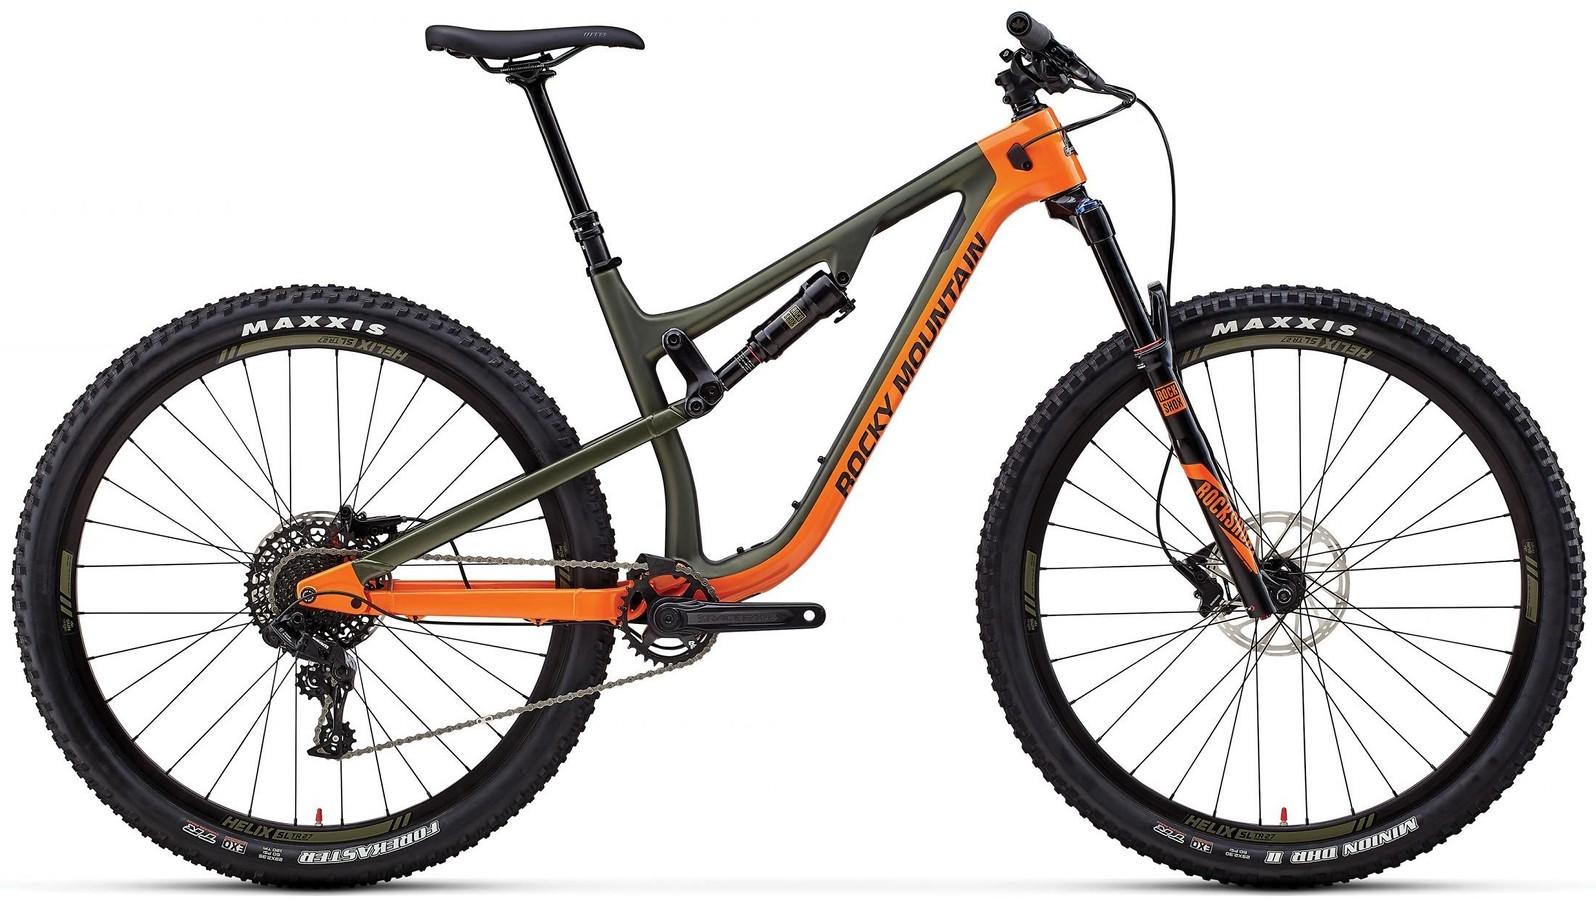 2018 Rocky Mountain Instinct Carbon 30 Bike Instinct_C30_Orange